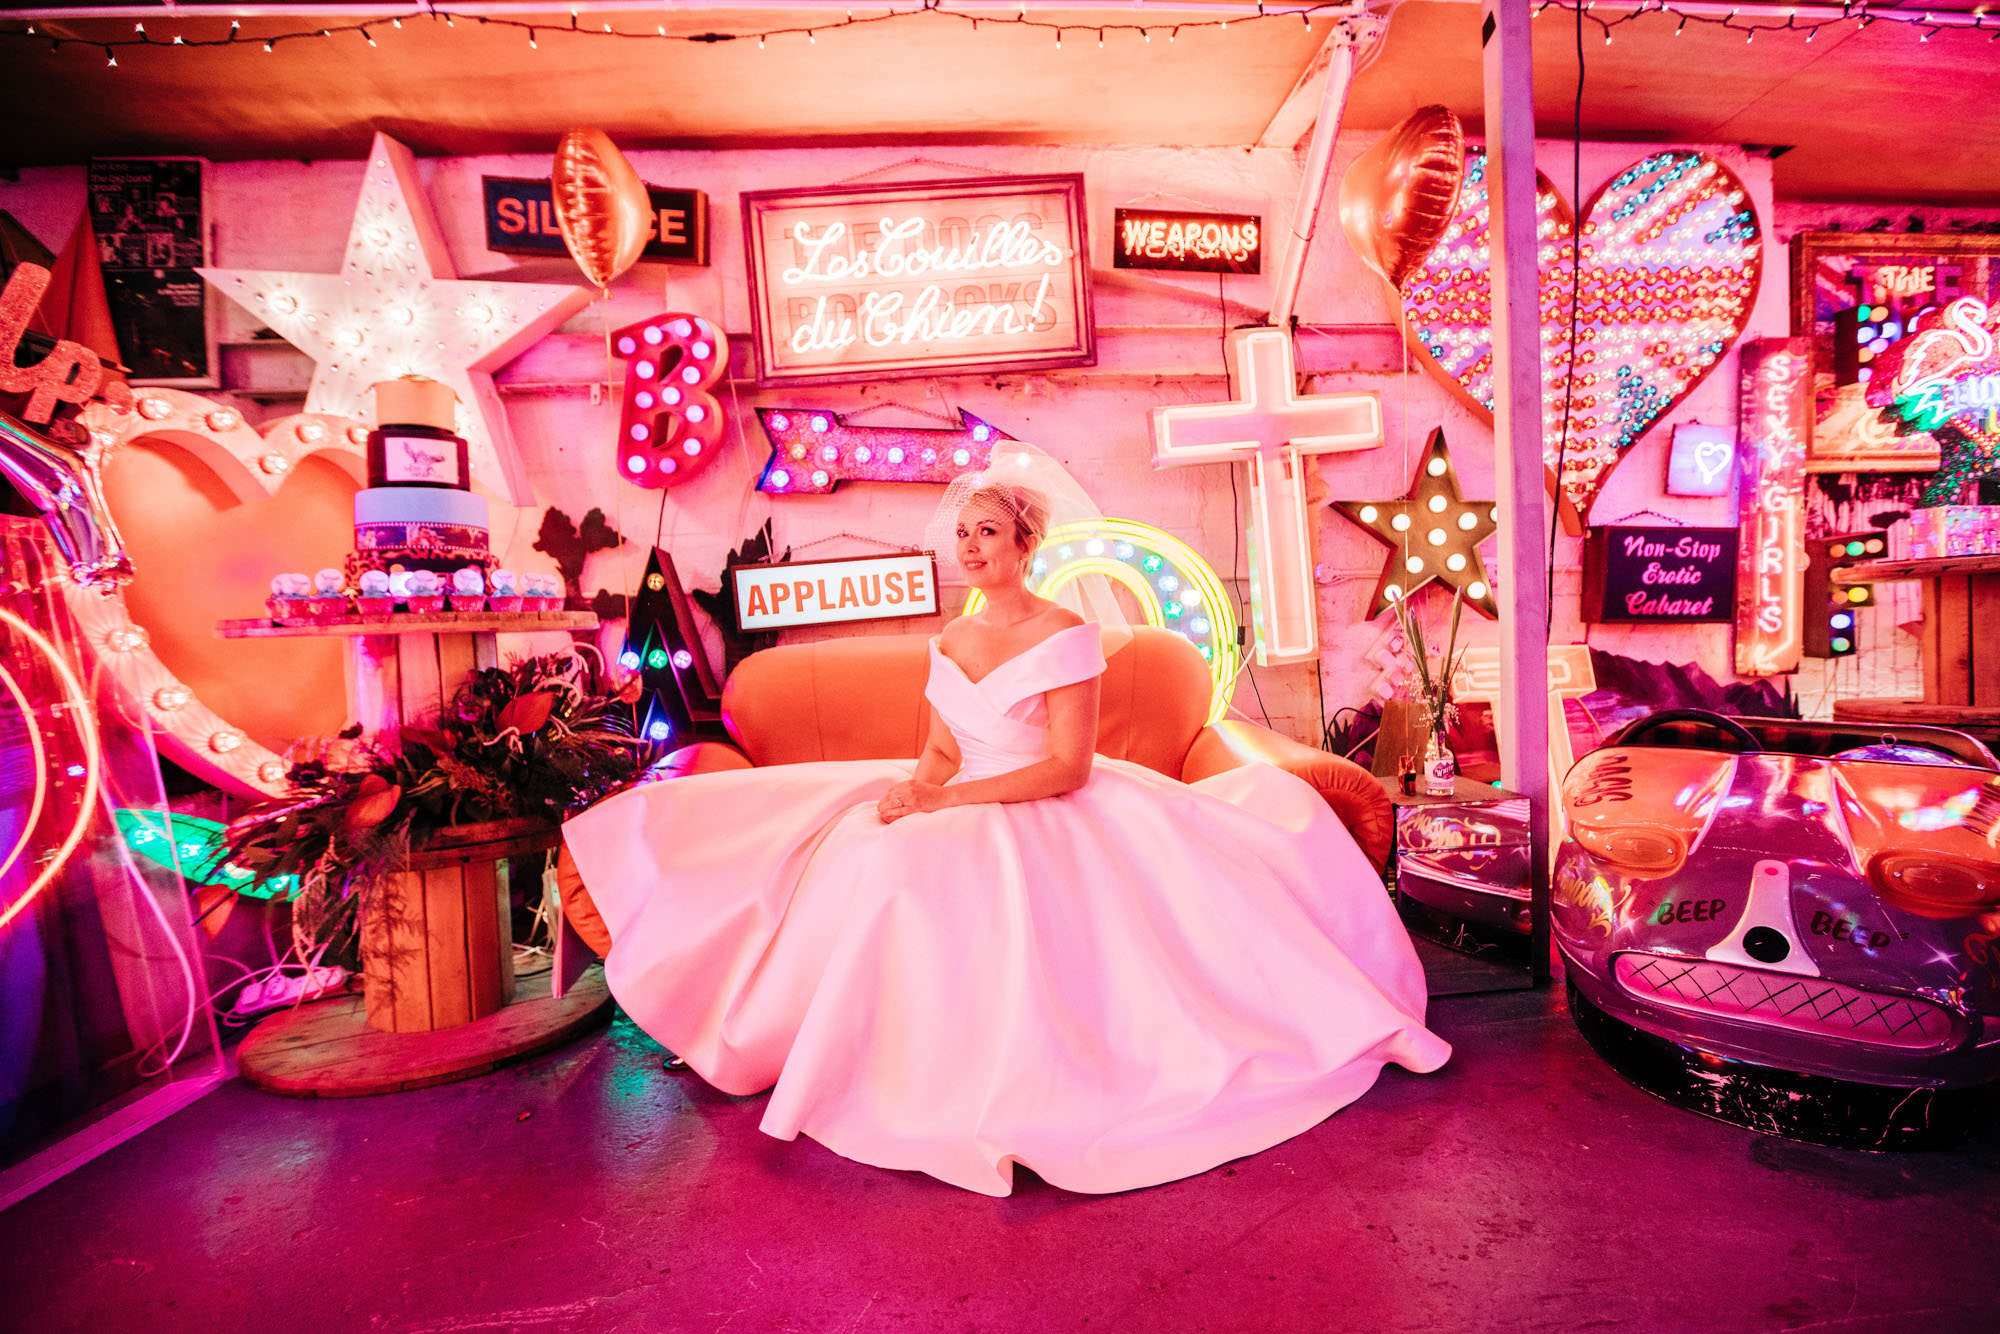 LOVED UP FILMS - Epic, fun wedding films